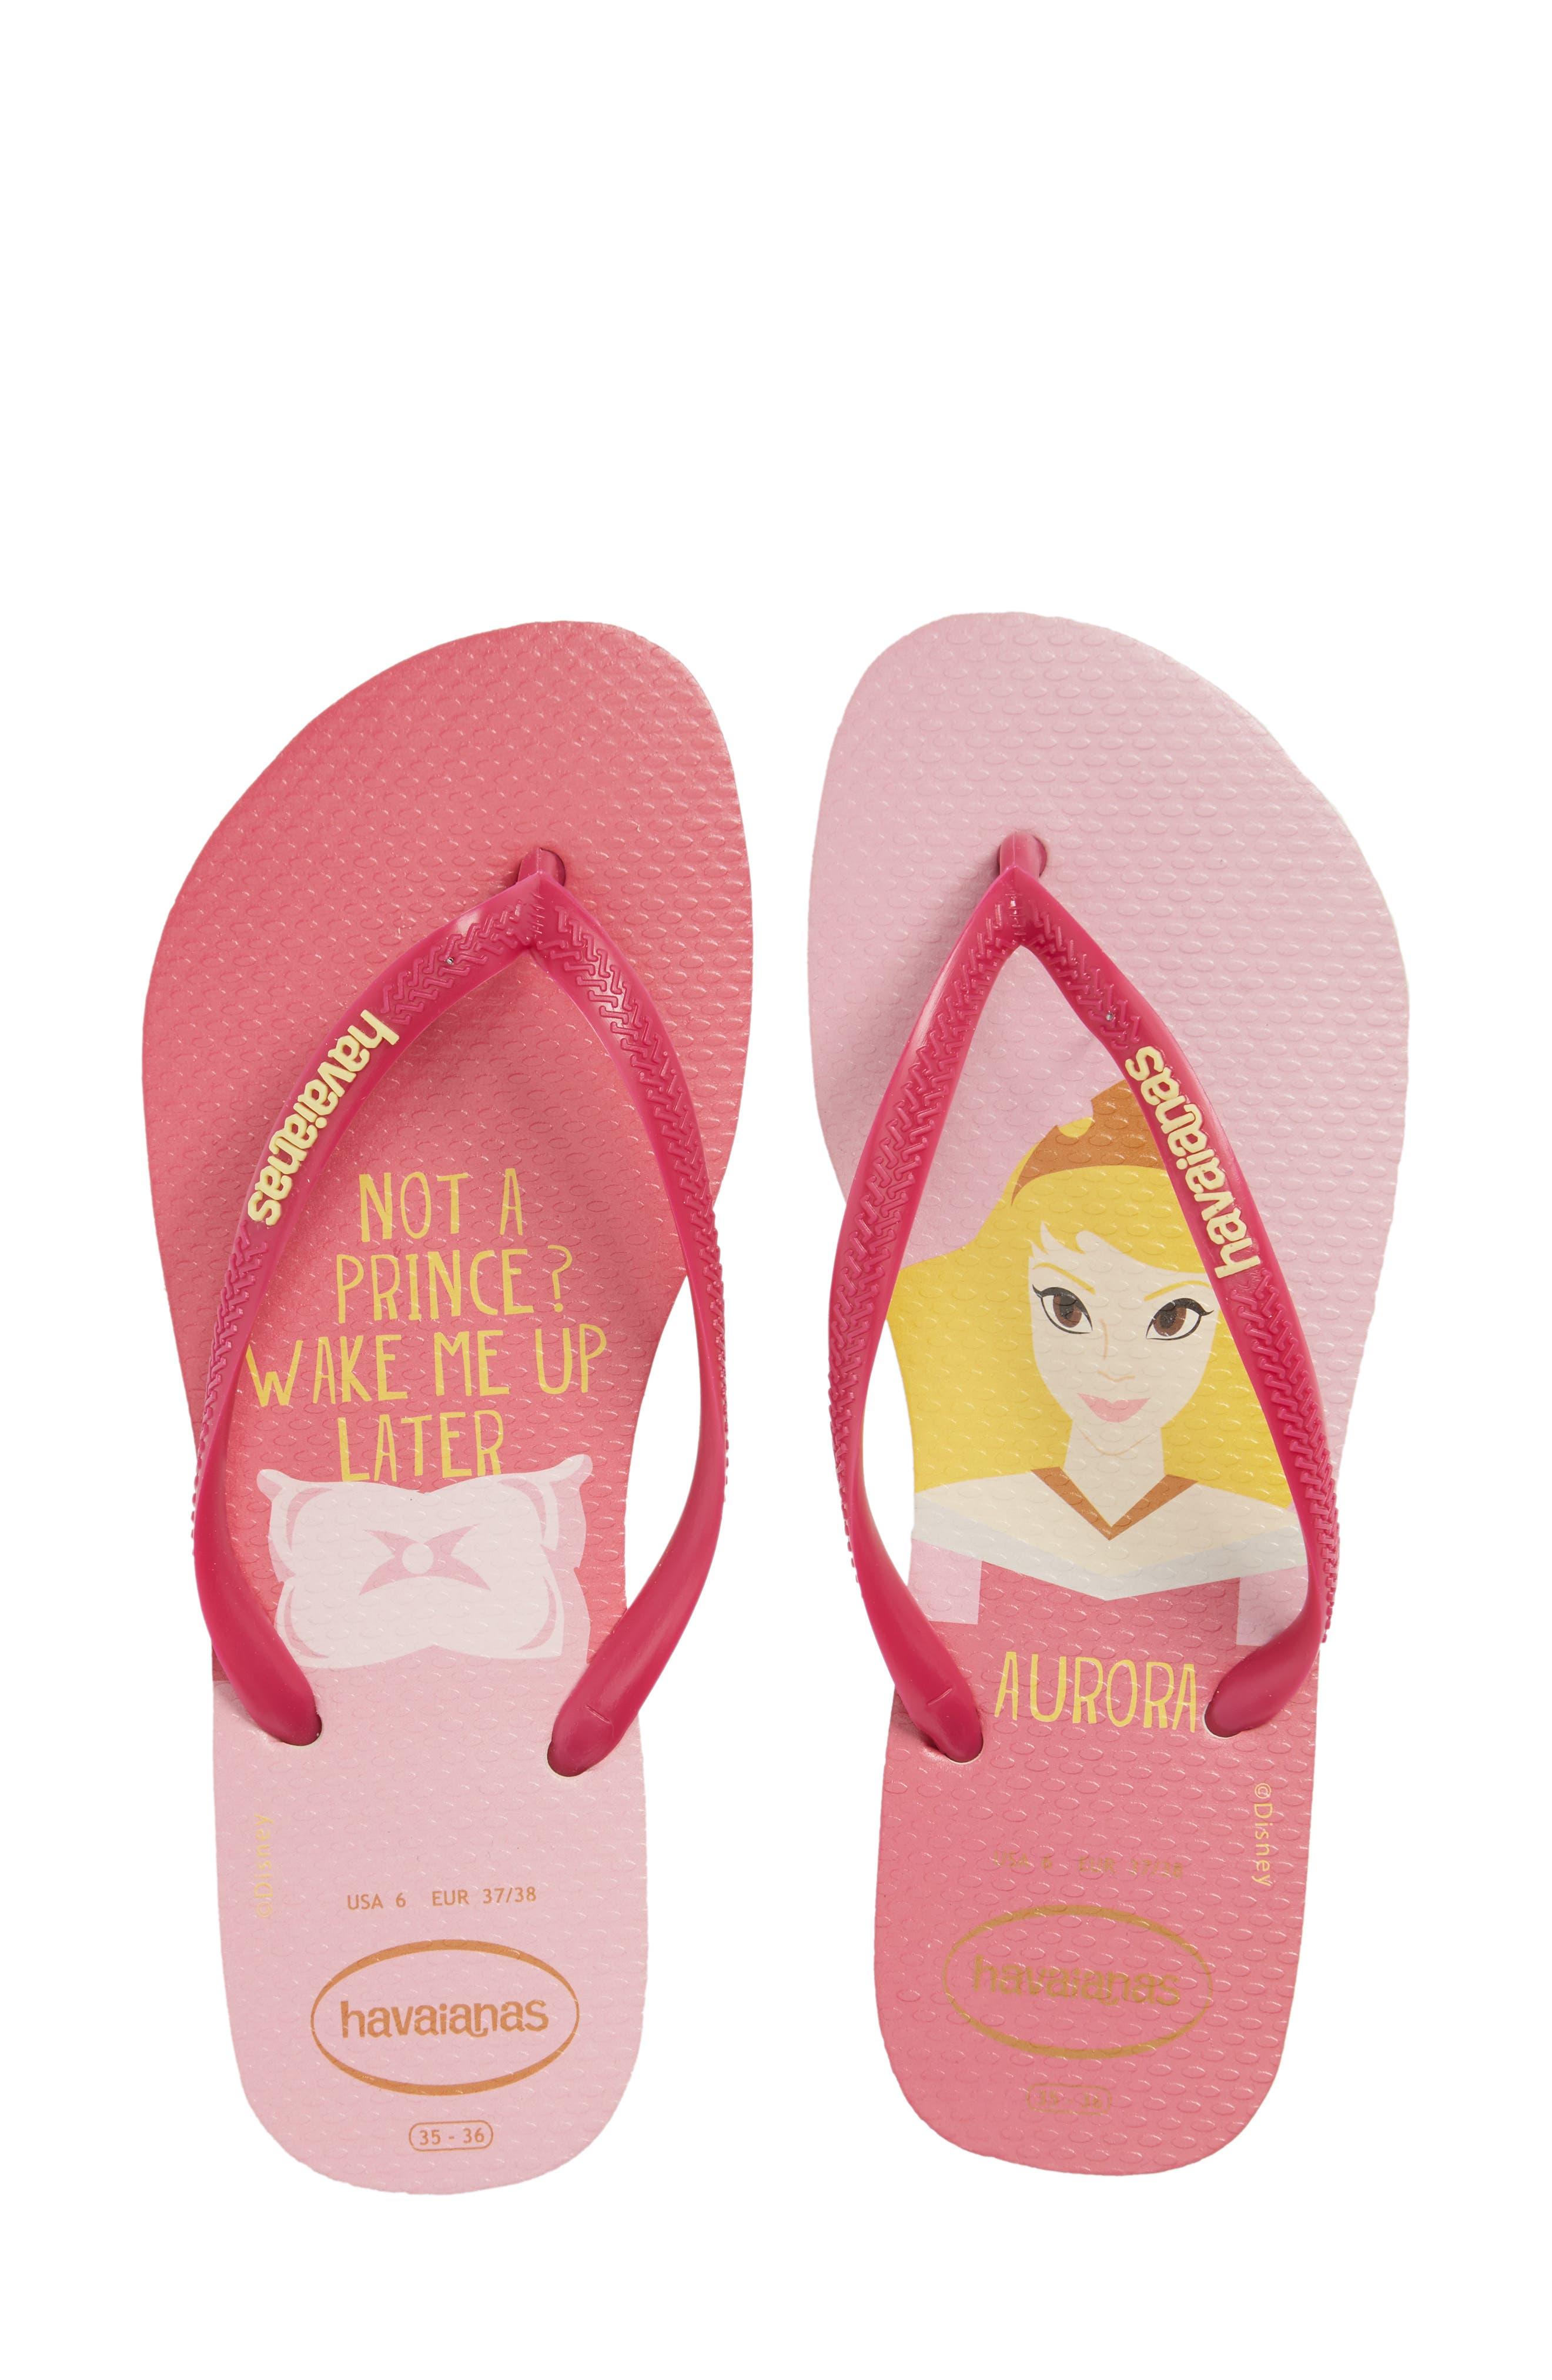 Havaiana Slim - Disney Princess Flip Flop,                         Main,                         color, Beige/ Pink